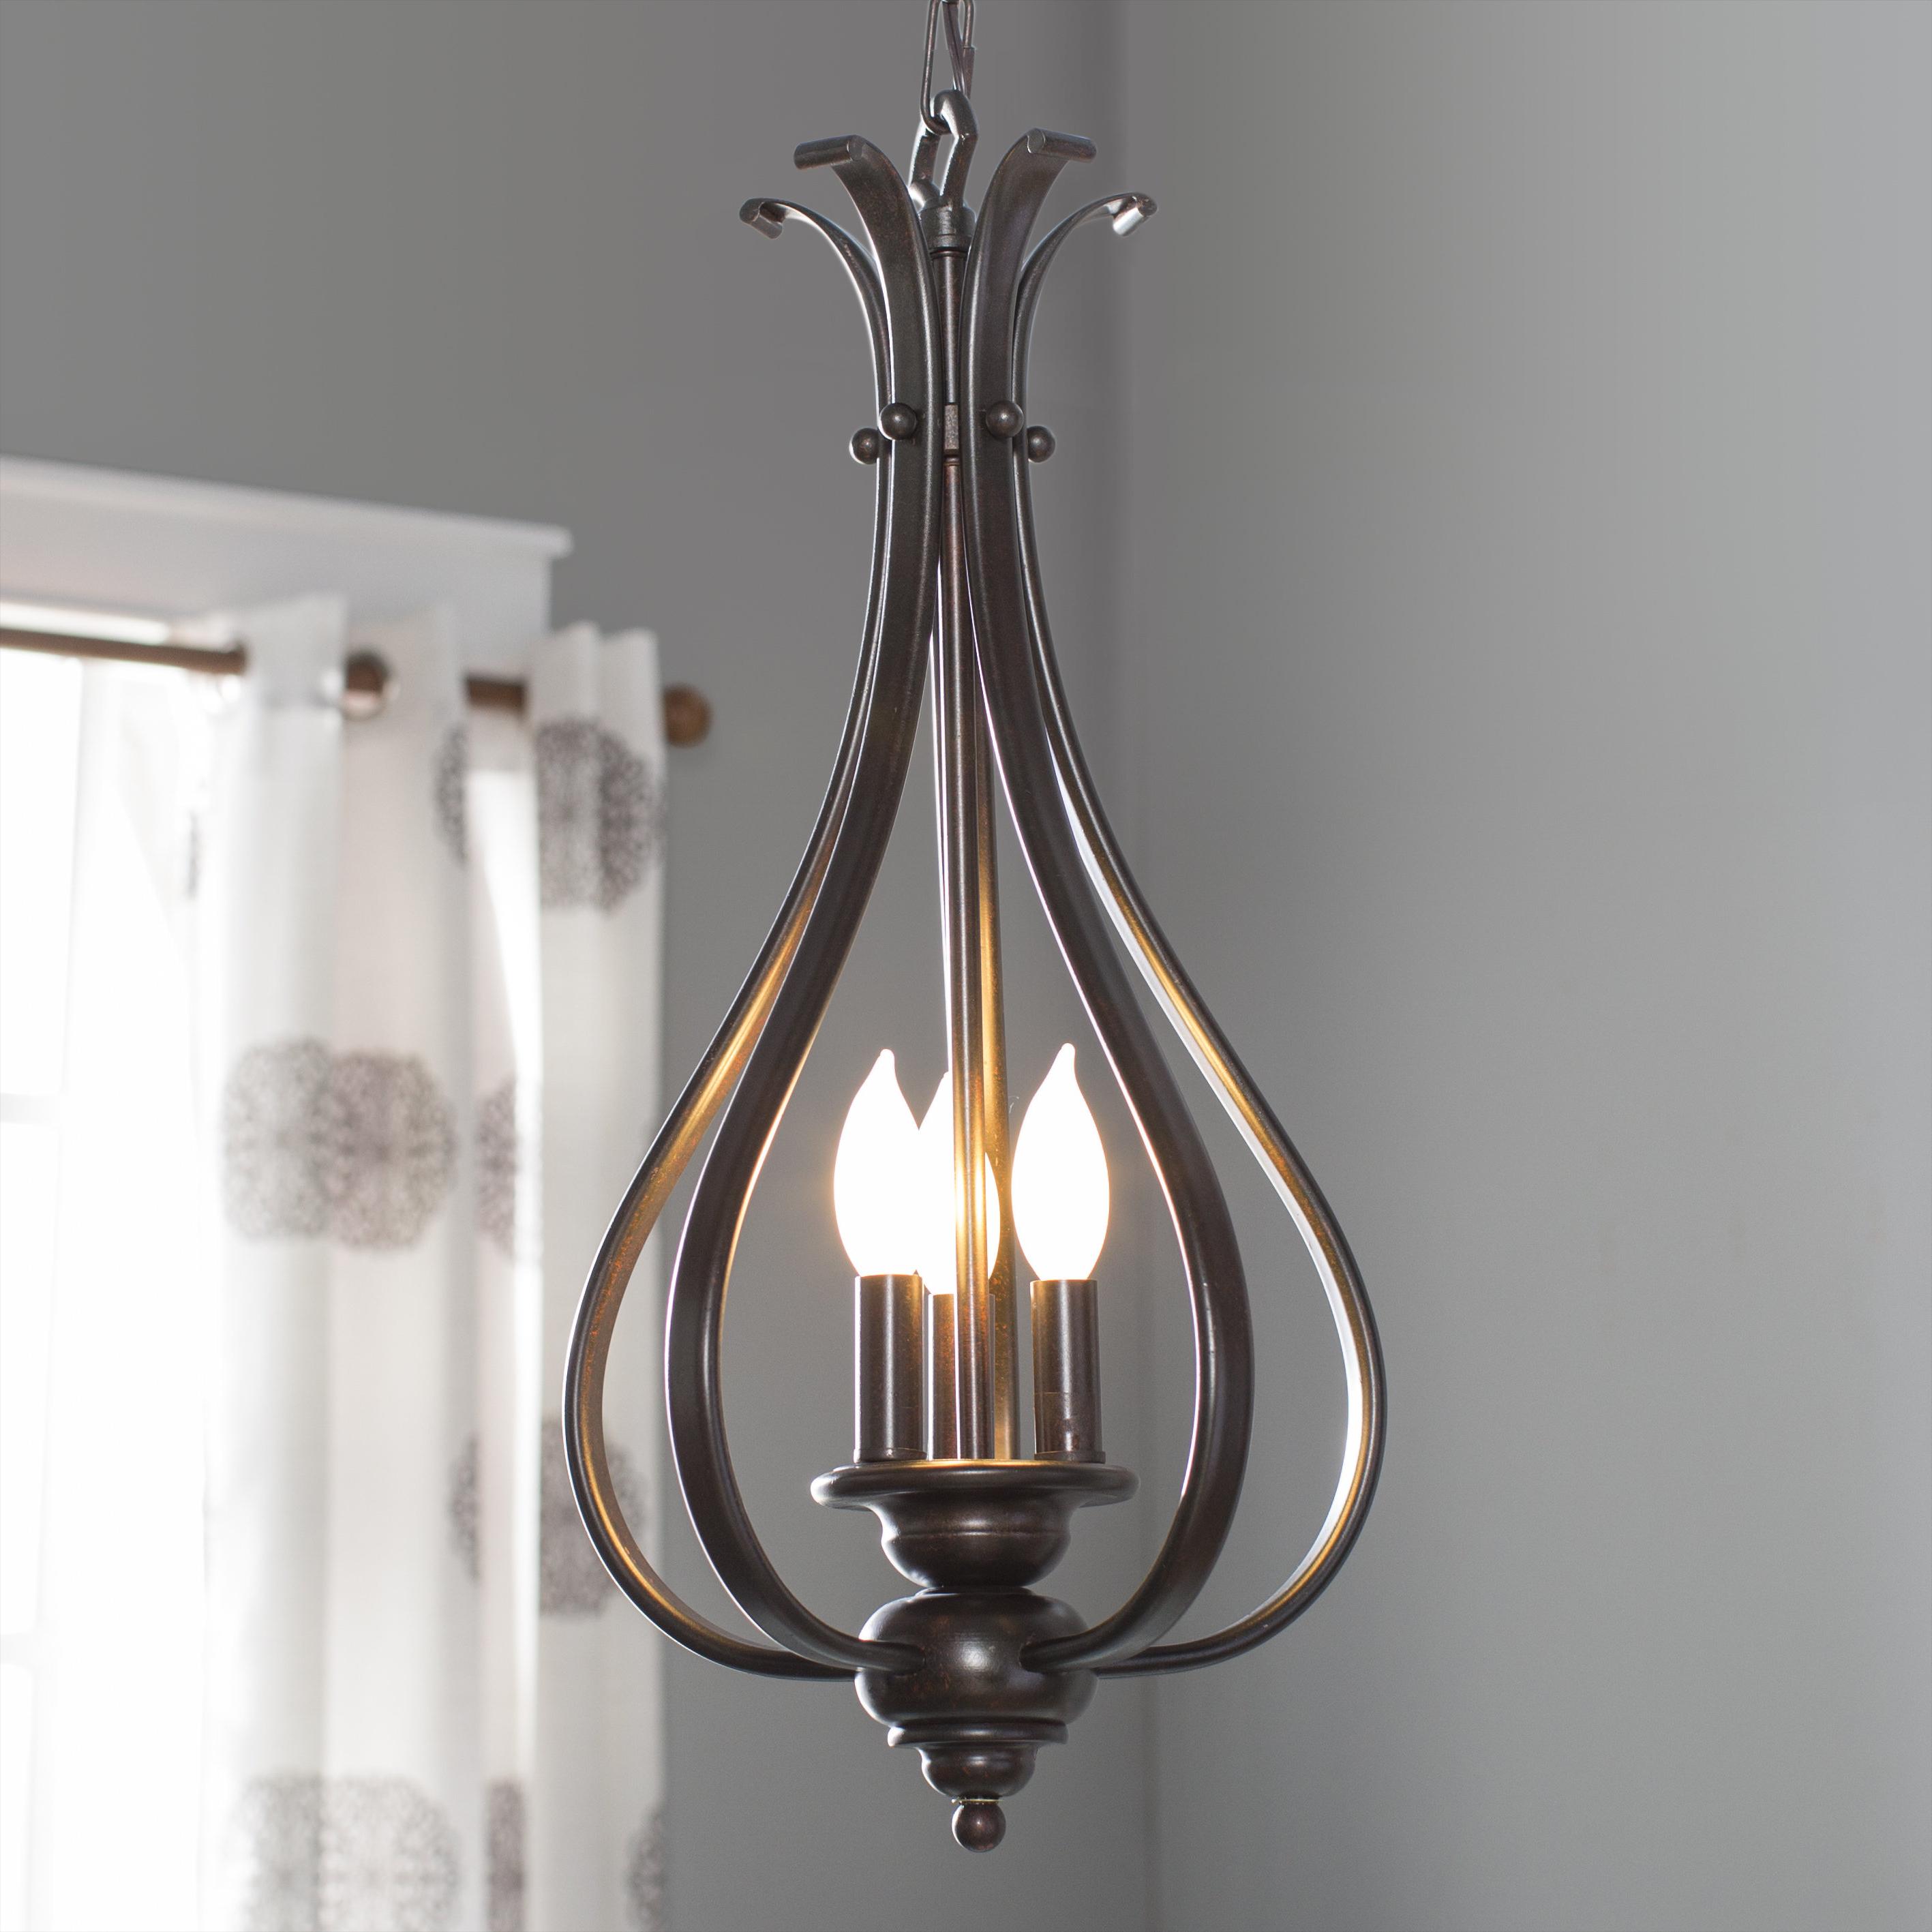 Van Horne 3 Light Single Teardrop Pendant With Regard To Most Current Warner Robins 3 Light Lantern Pendants (View 15 of 20)